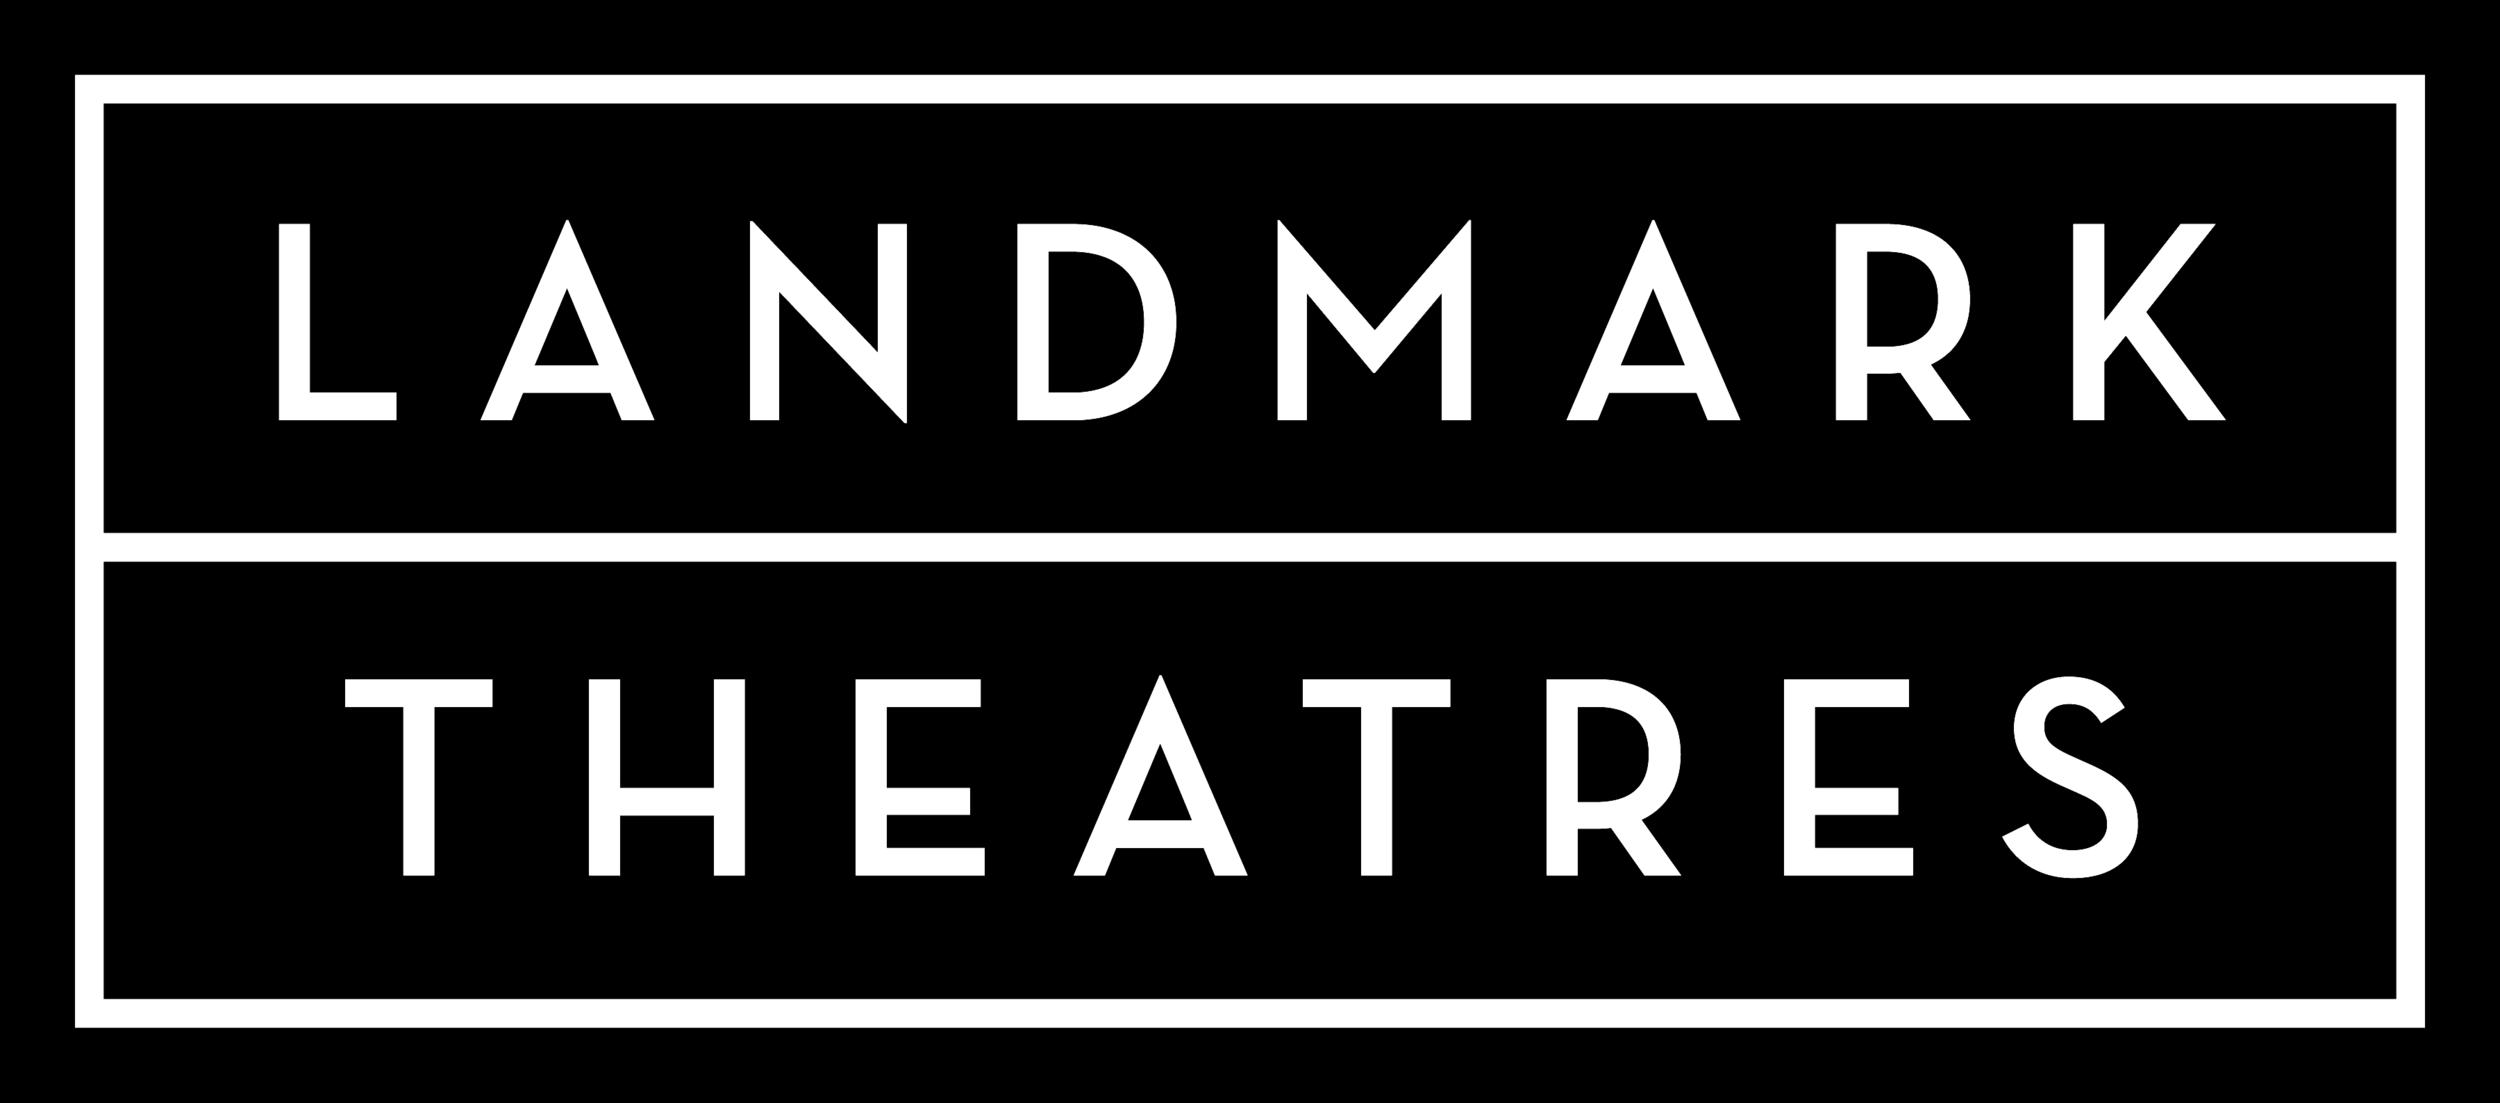 Landmark-Theatres-logo.png